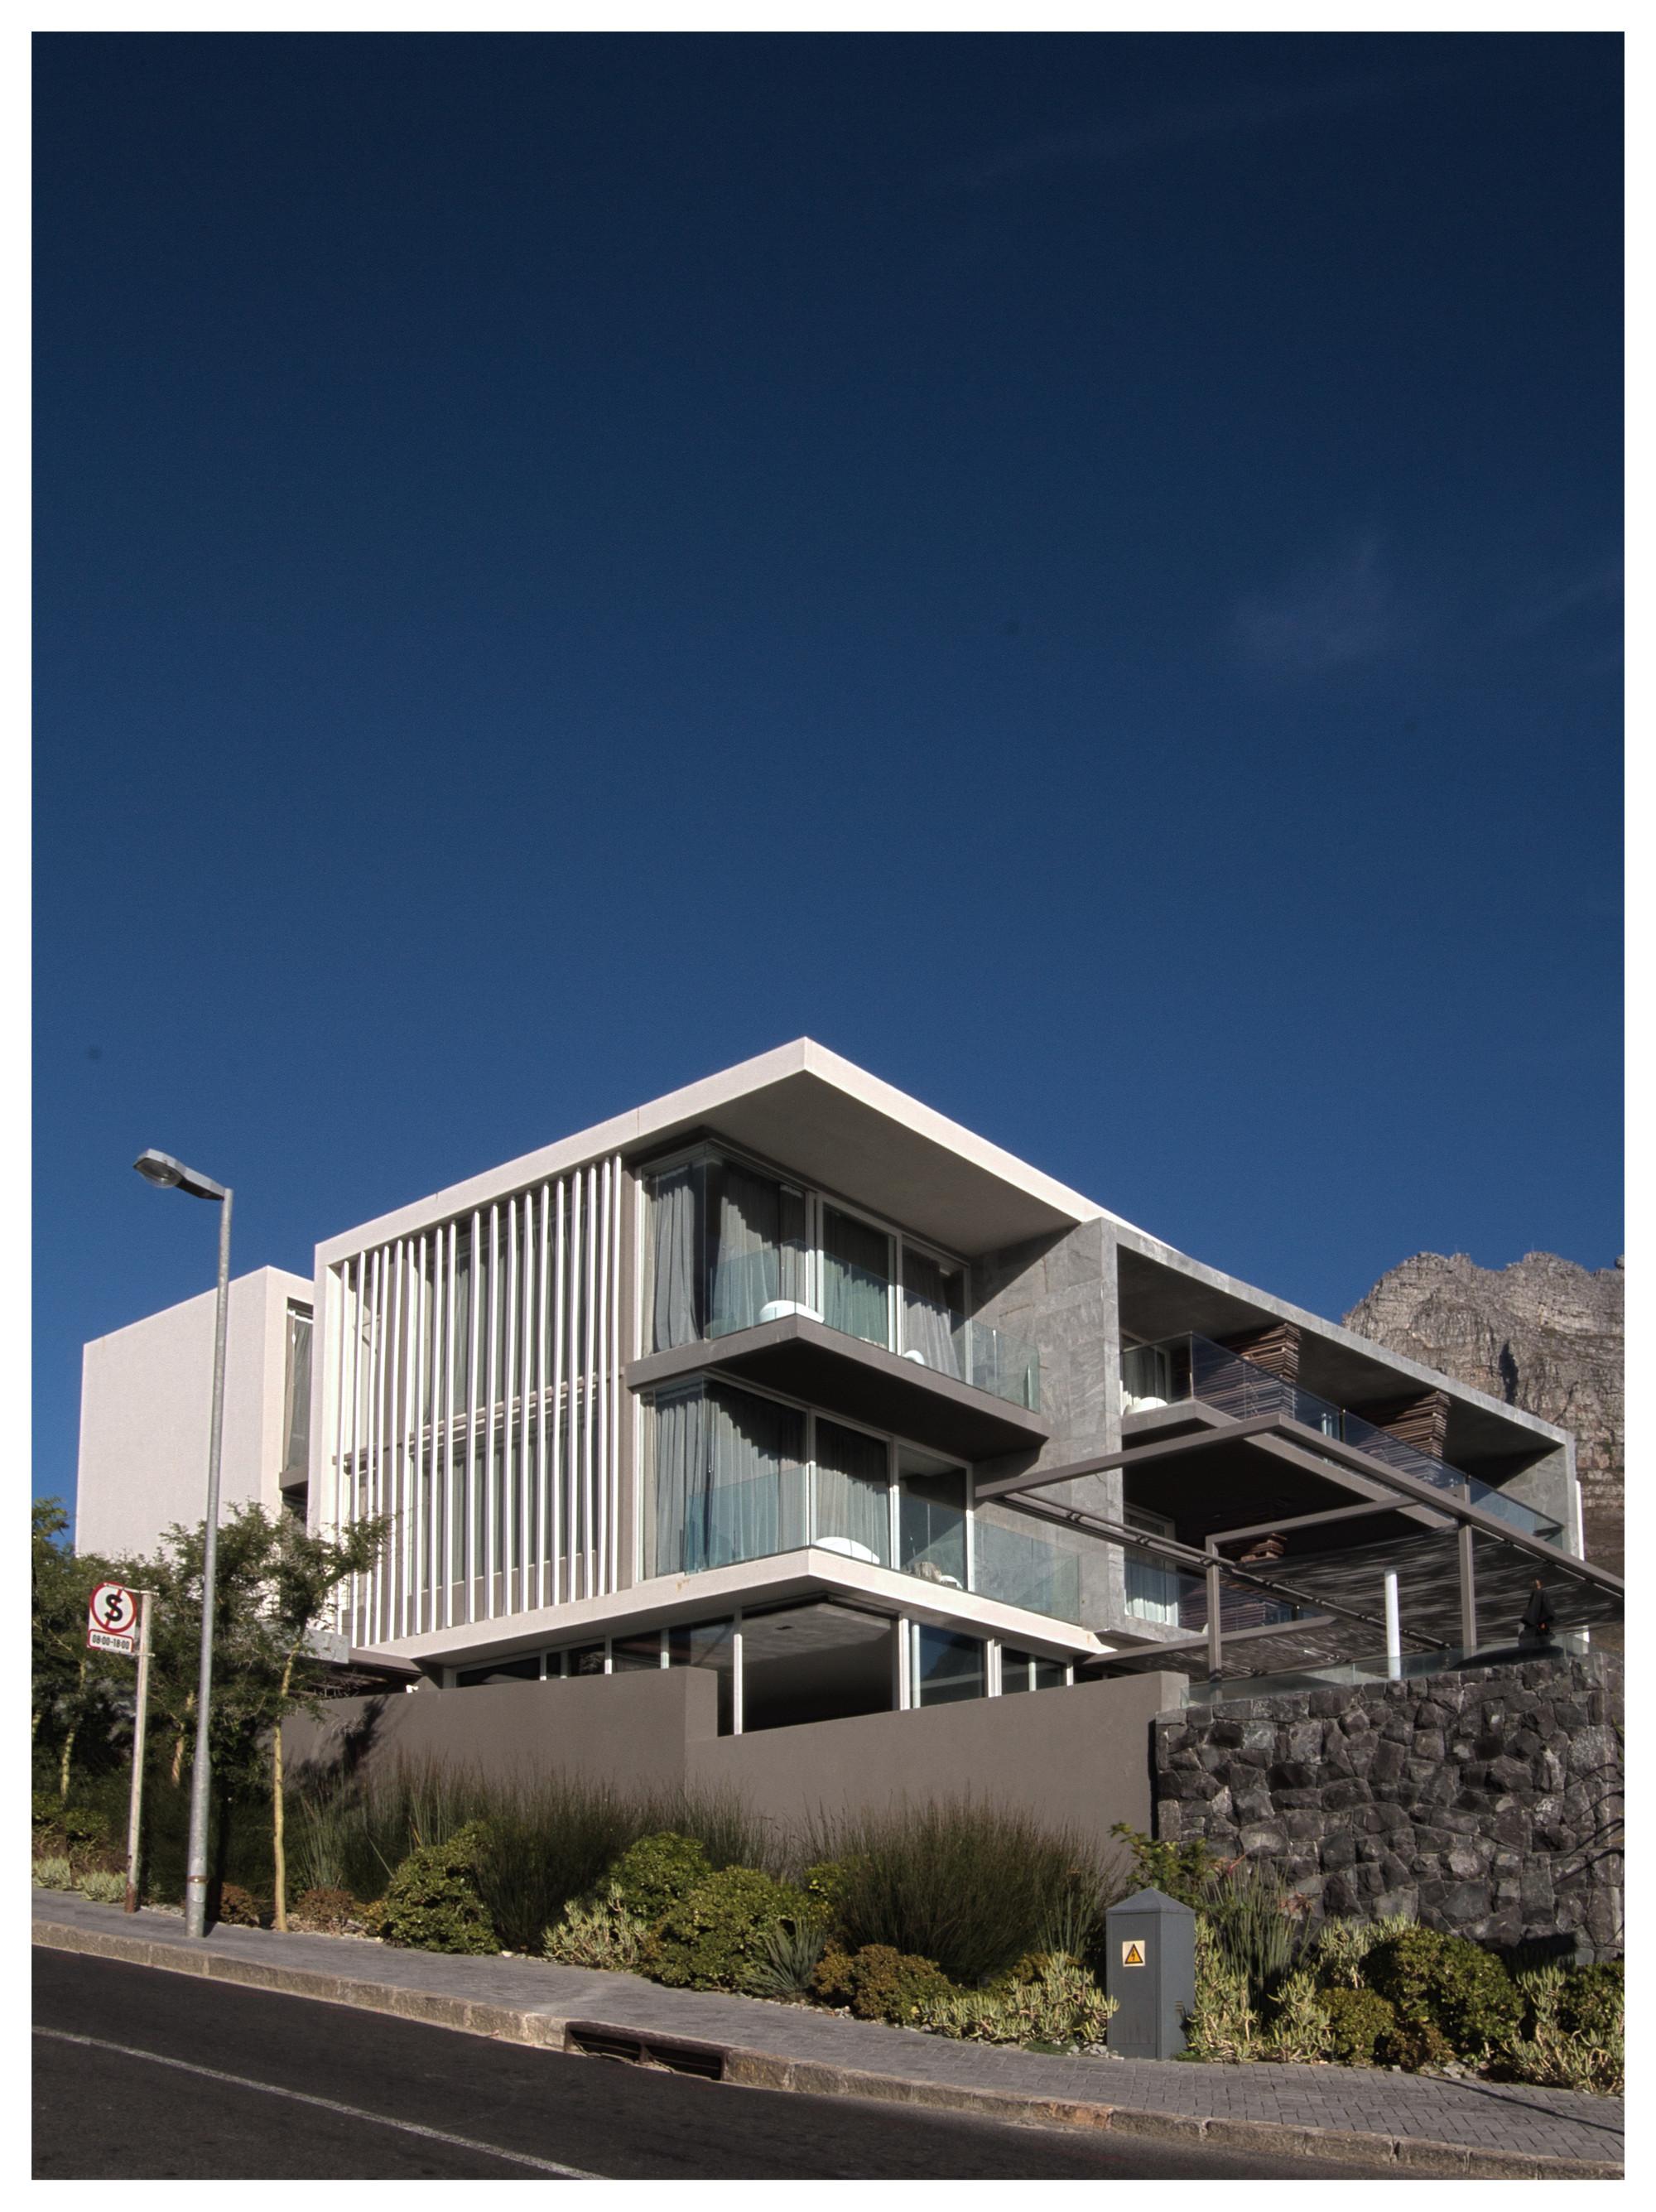 POD / Greg Wright Architects